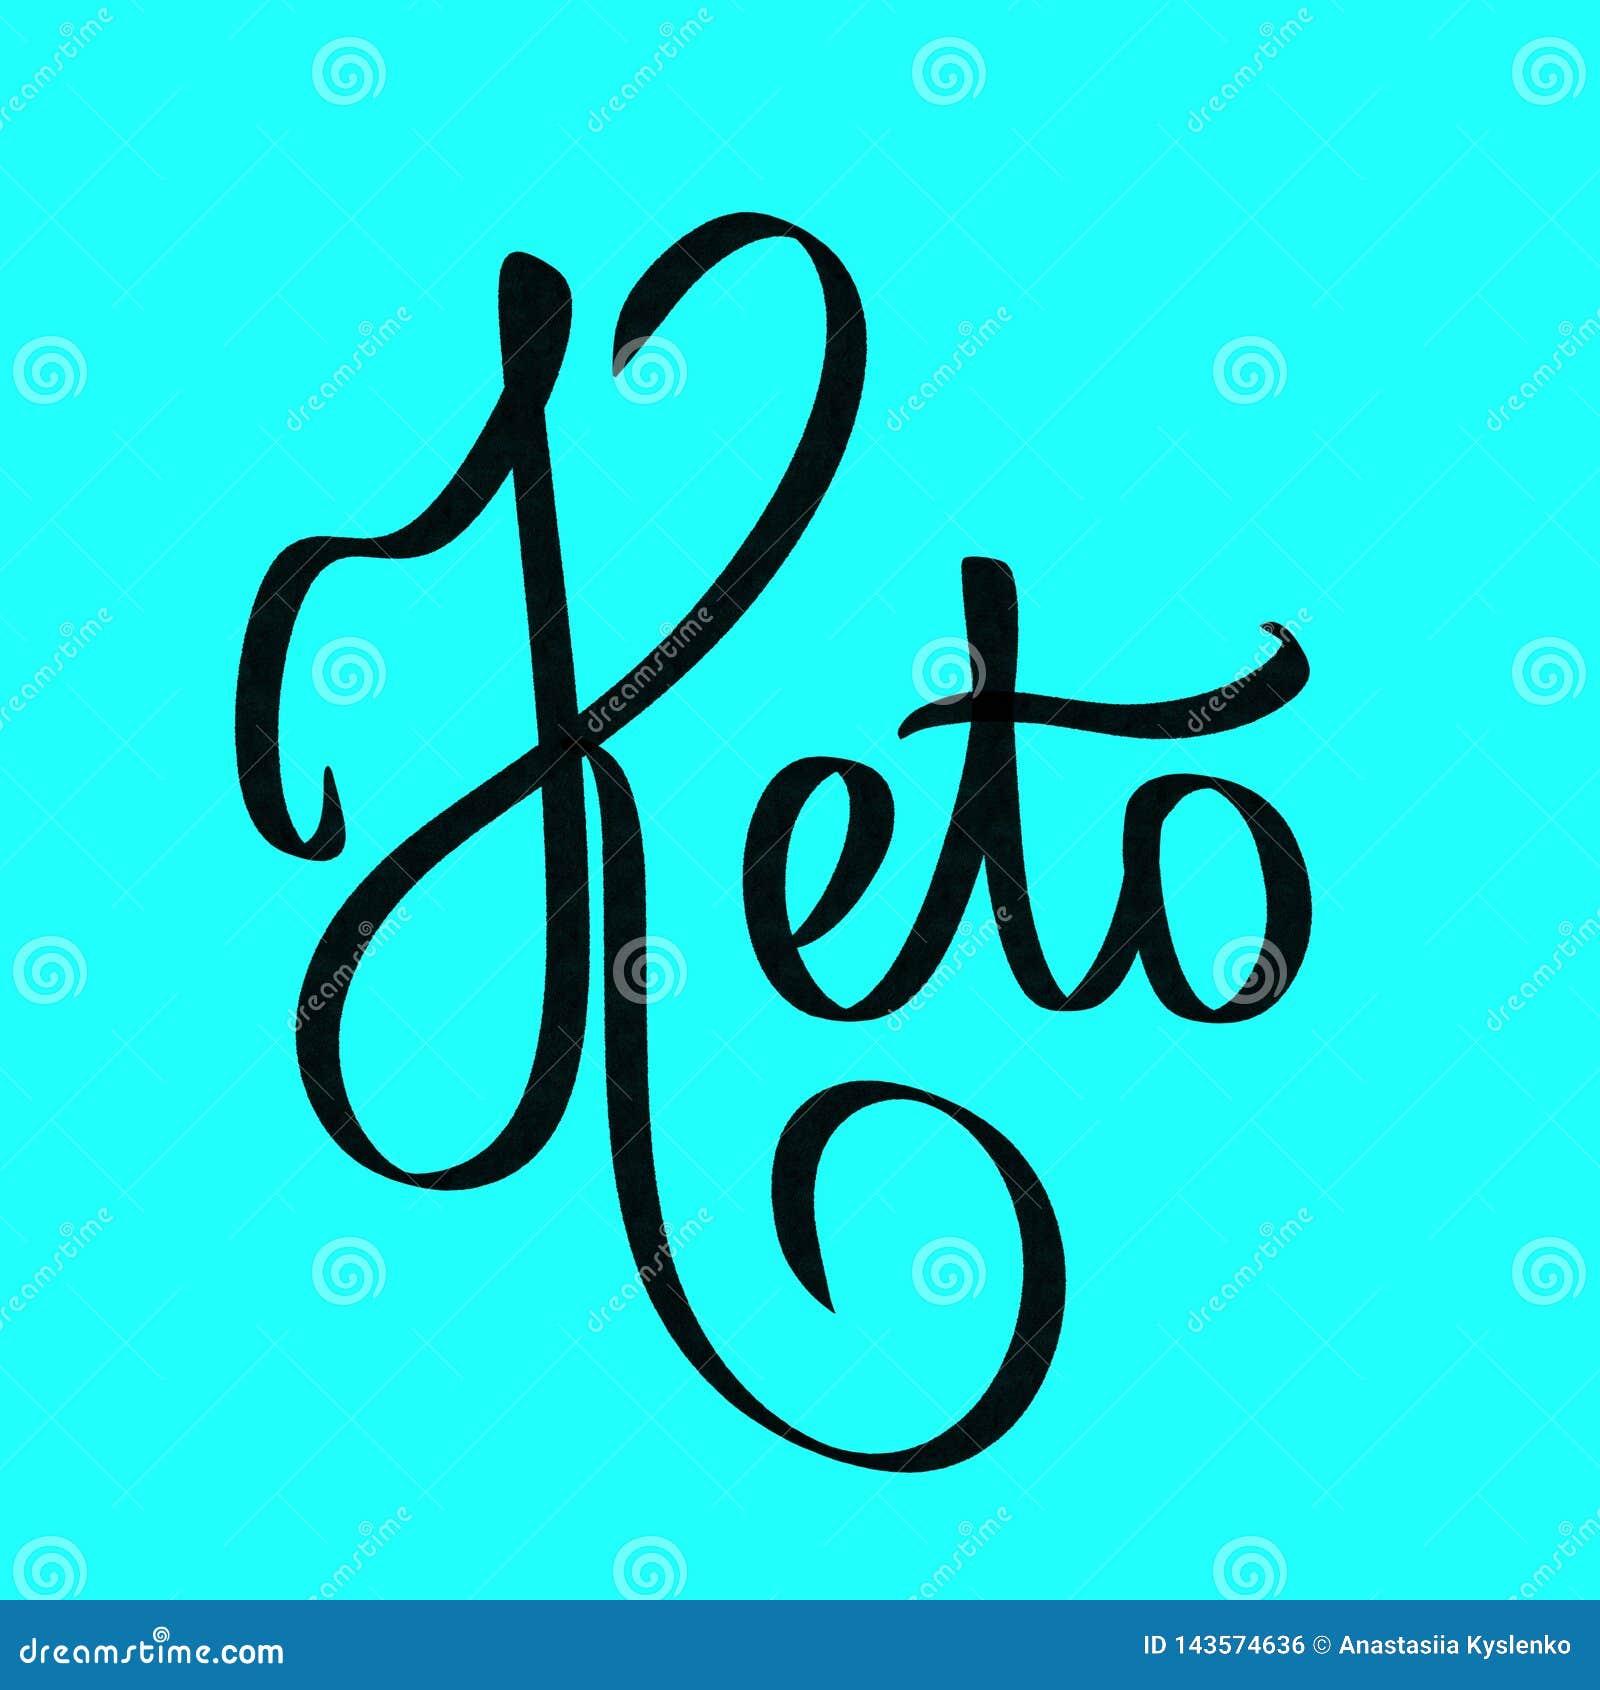 Keto. Lettering short word. Keto diet illustration. Black sign on blue background. Ketogenic nutrition phrase. Poster, banner